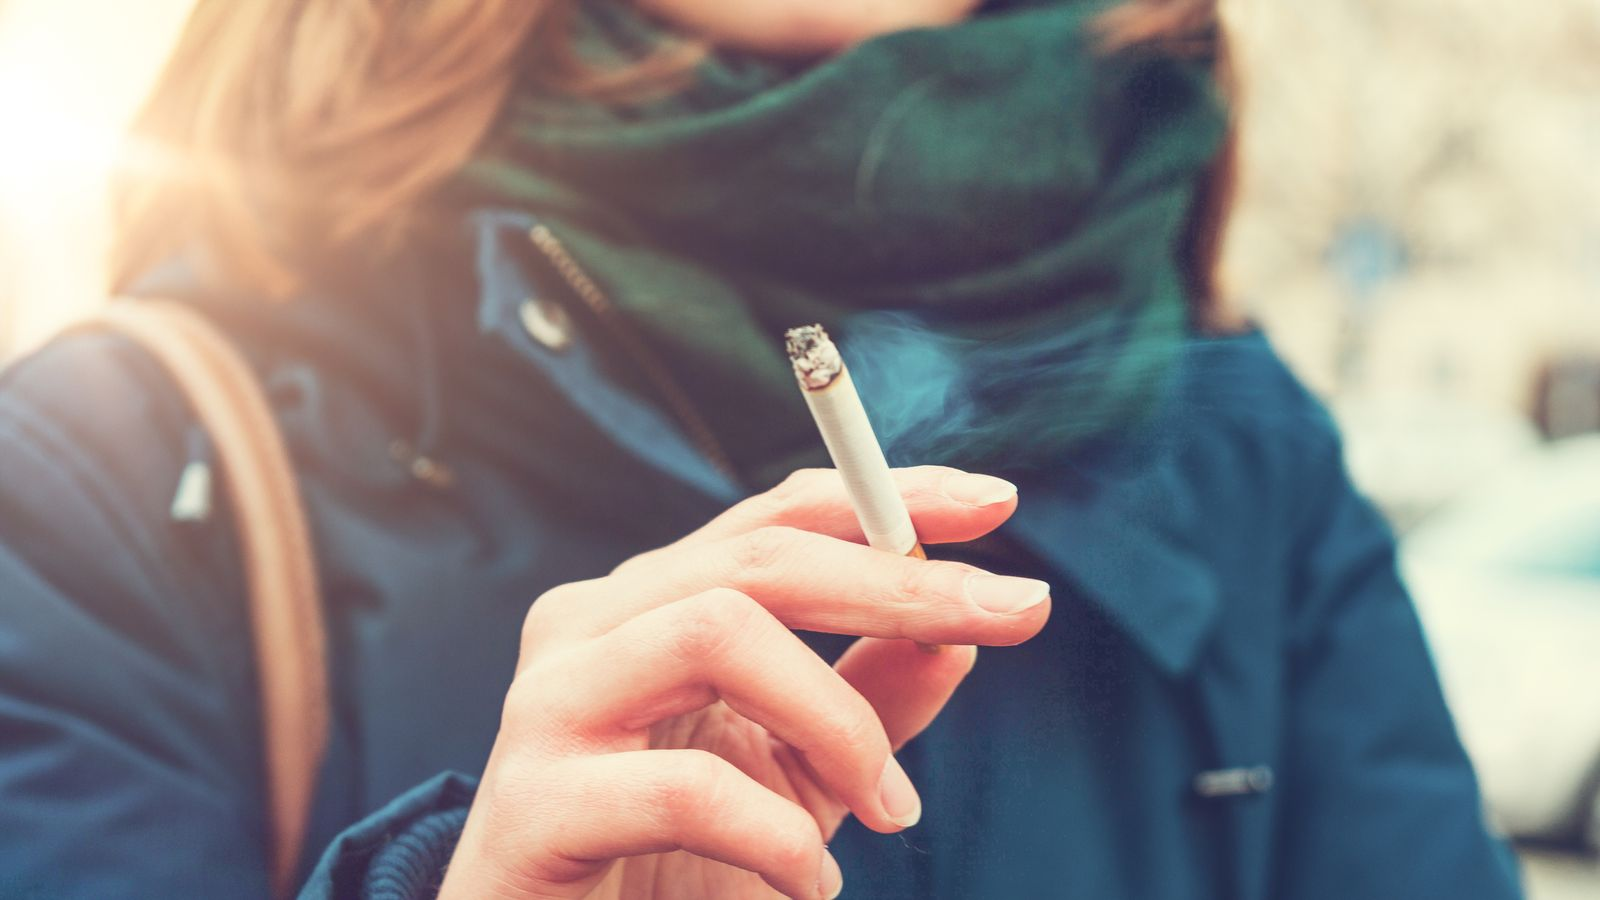 BAT highlights vaping shift but it's still cigarette sales producing multi-billion pound profits